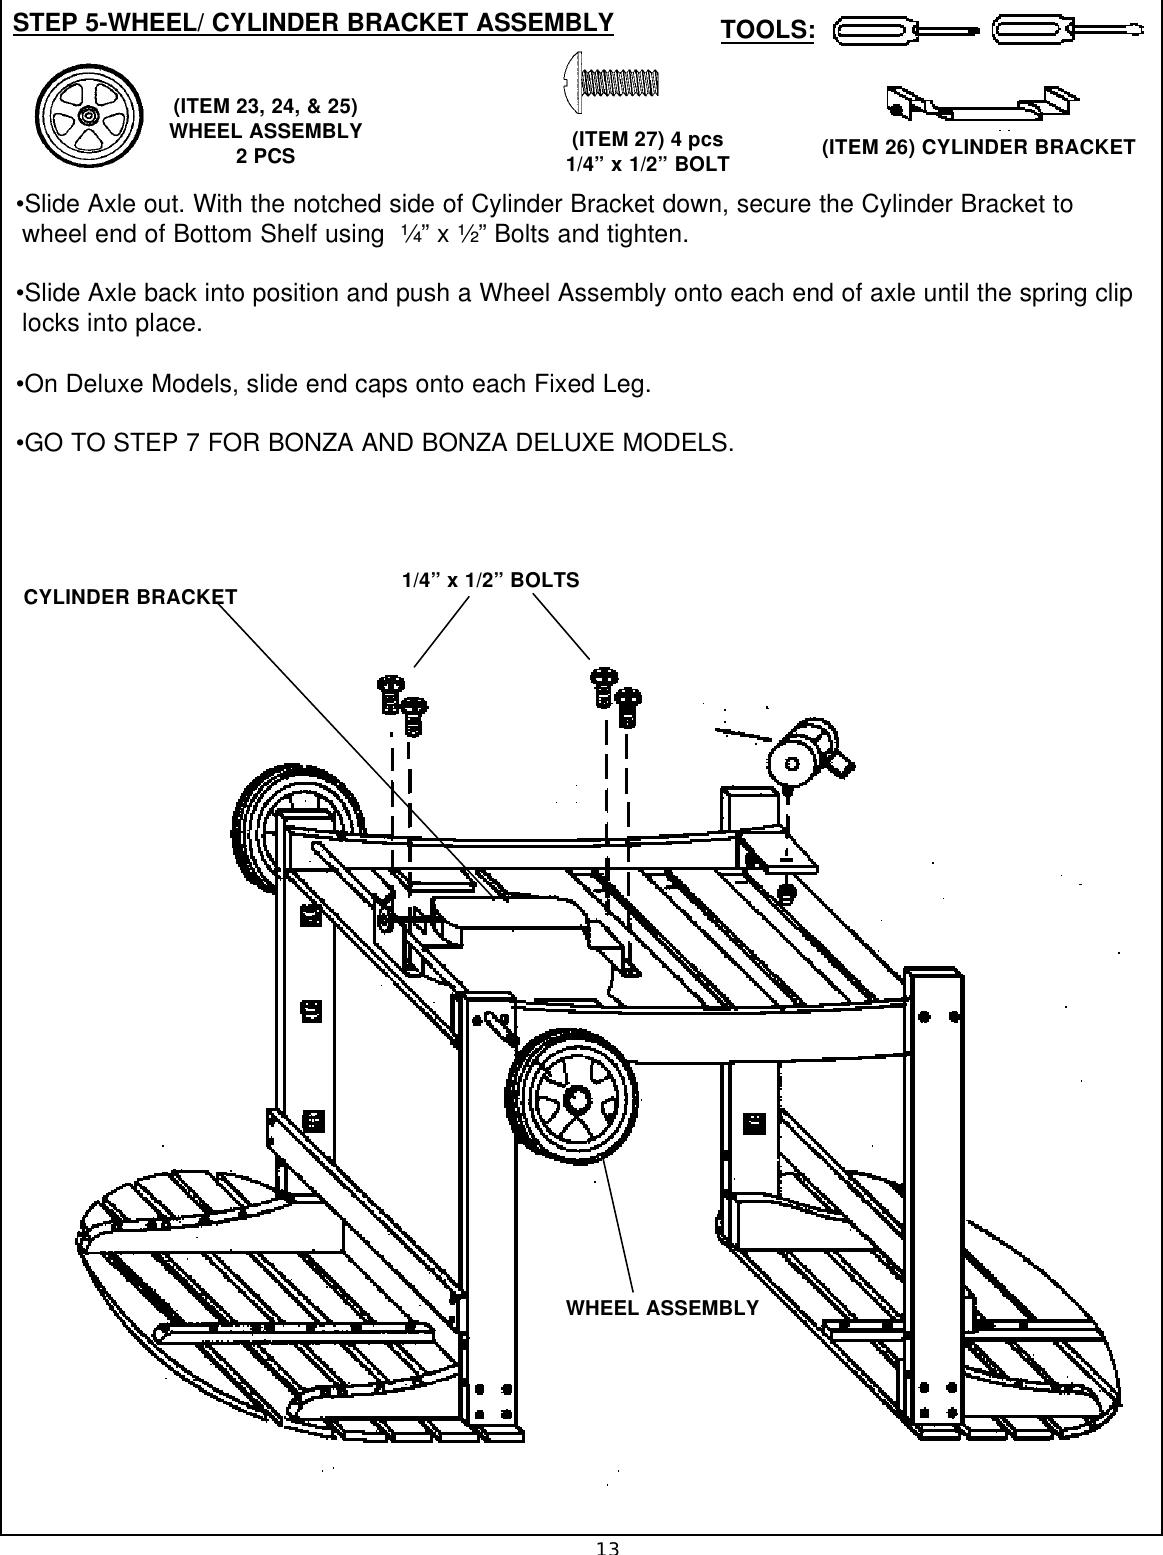 Aussie Bonza Users Manual Manual2